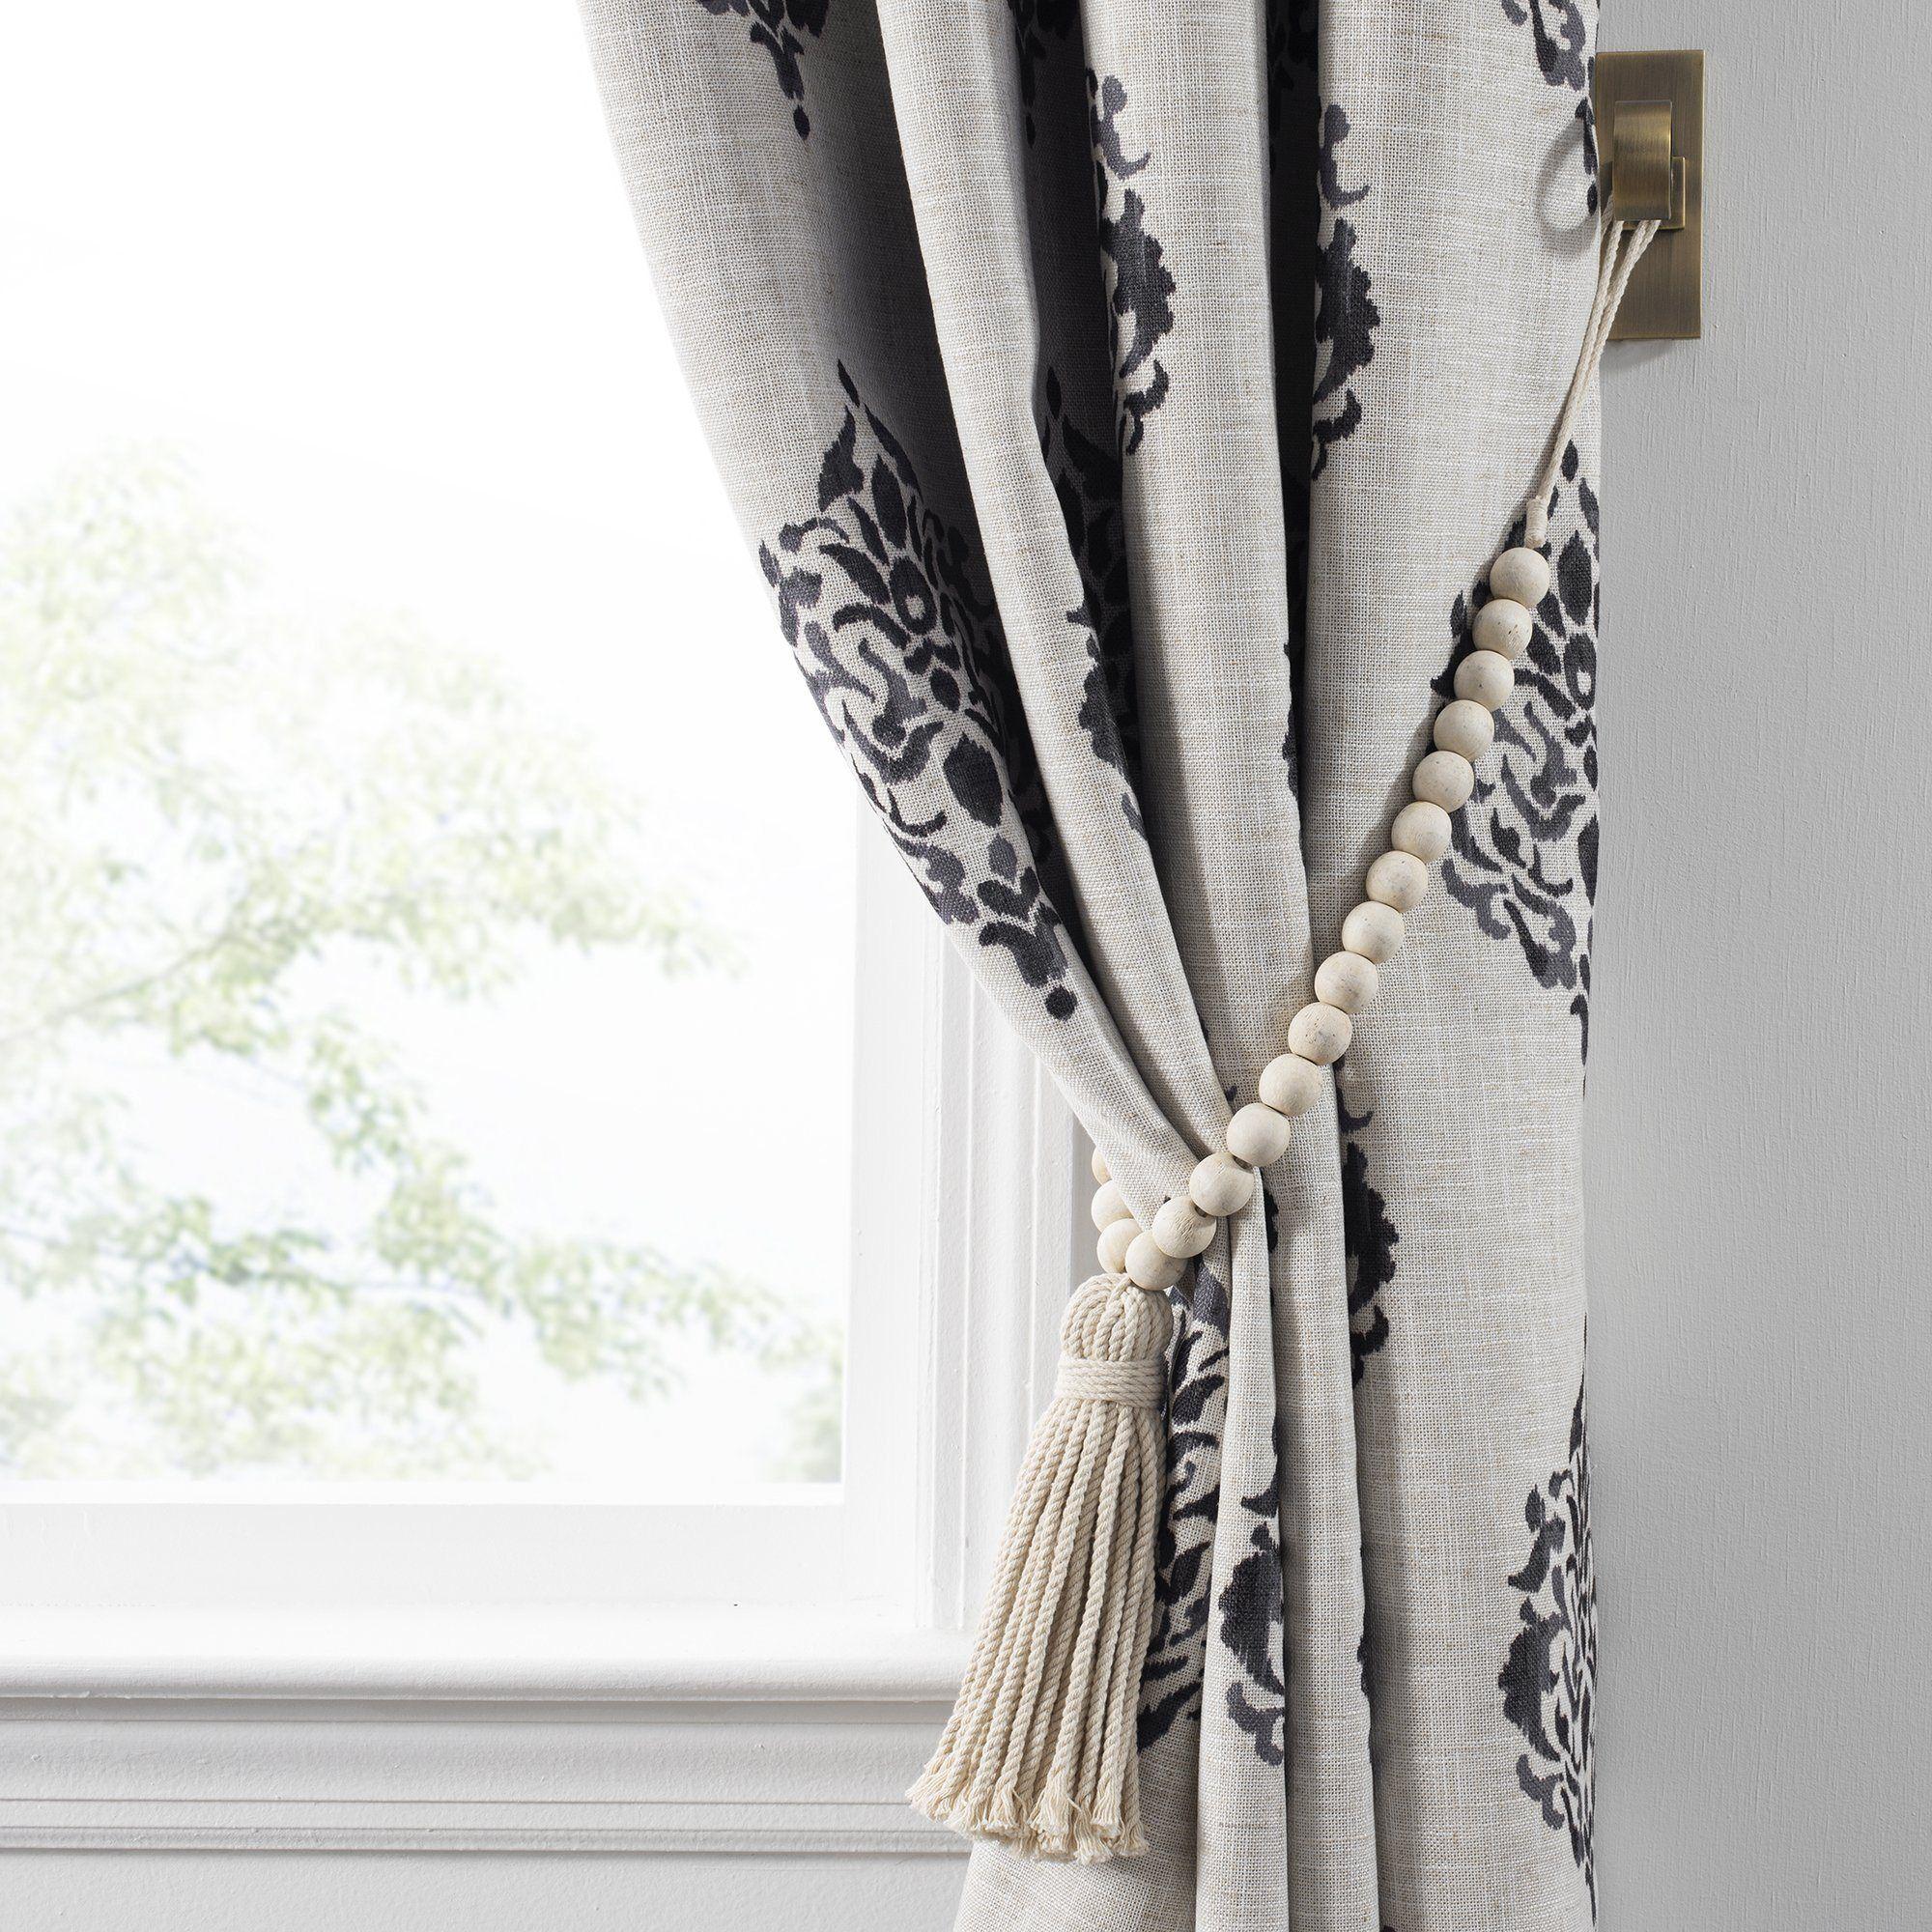 Nomad Decorative Wooden Fringe Tassel Window Curtain Tieback In